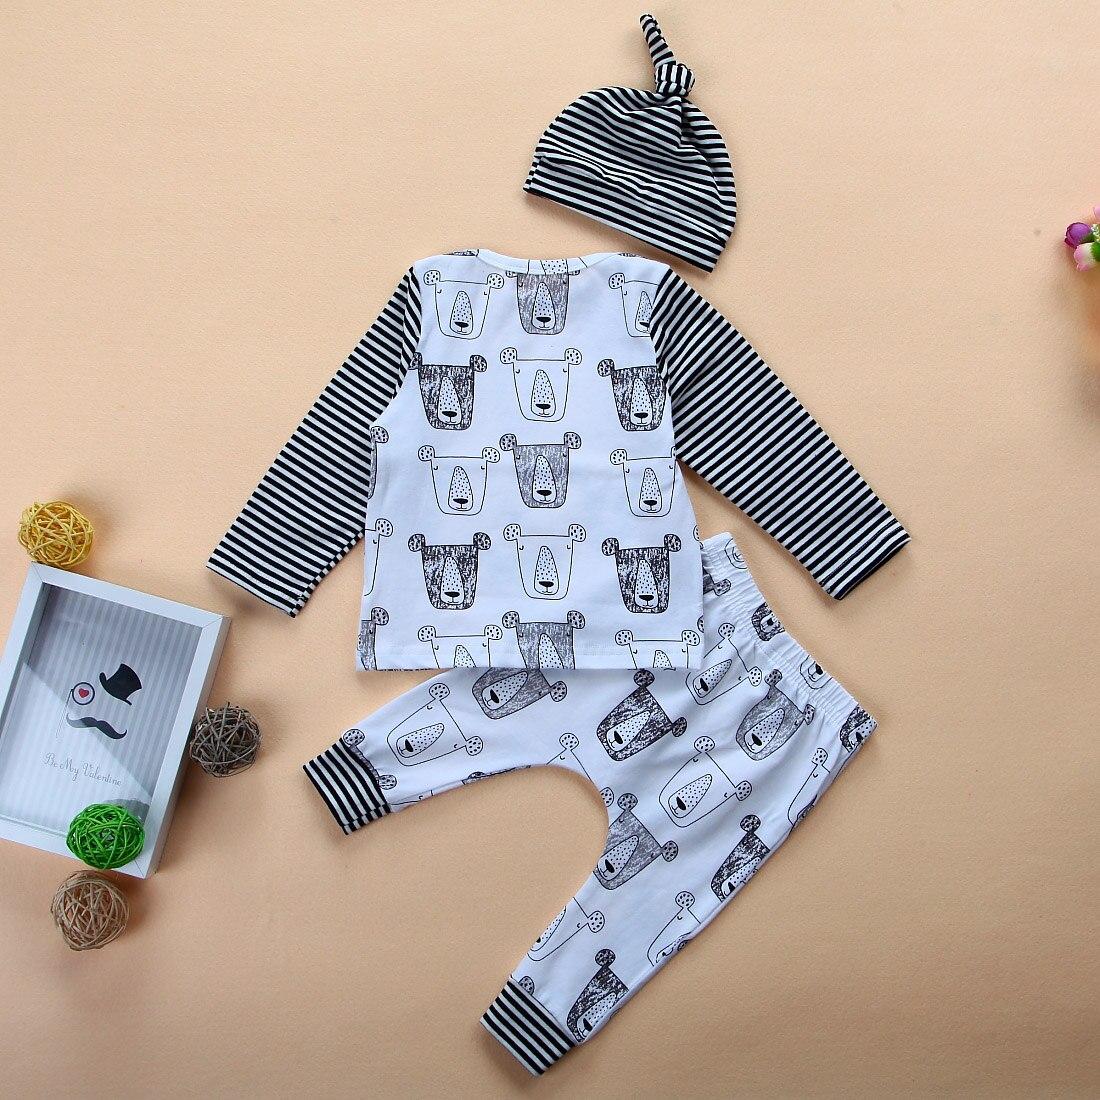 3pcs 2017 New autumn baby girls Boys animal print clothes set Newborn Baby lion long sleeve T shirt Tops+Pants +Hat Outfits Sets